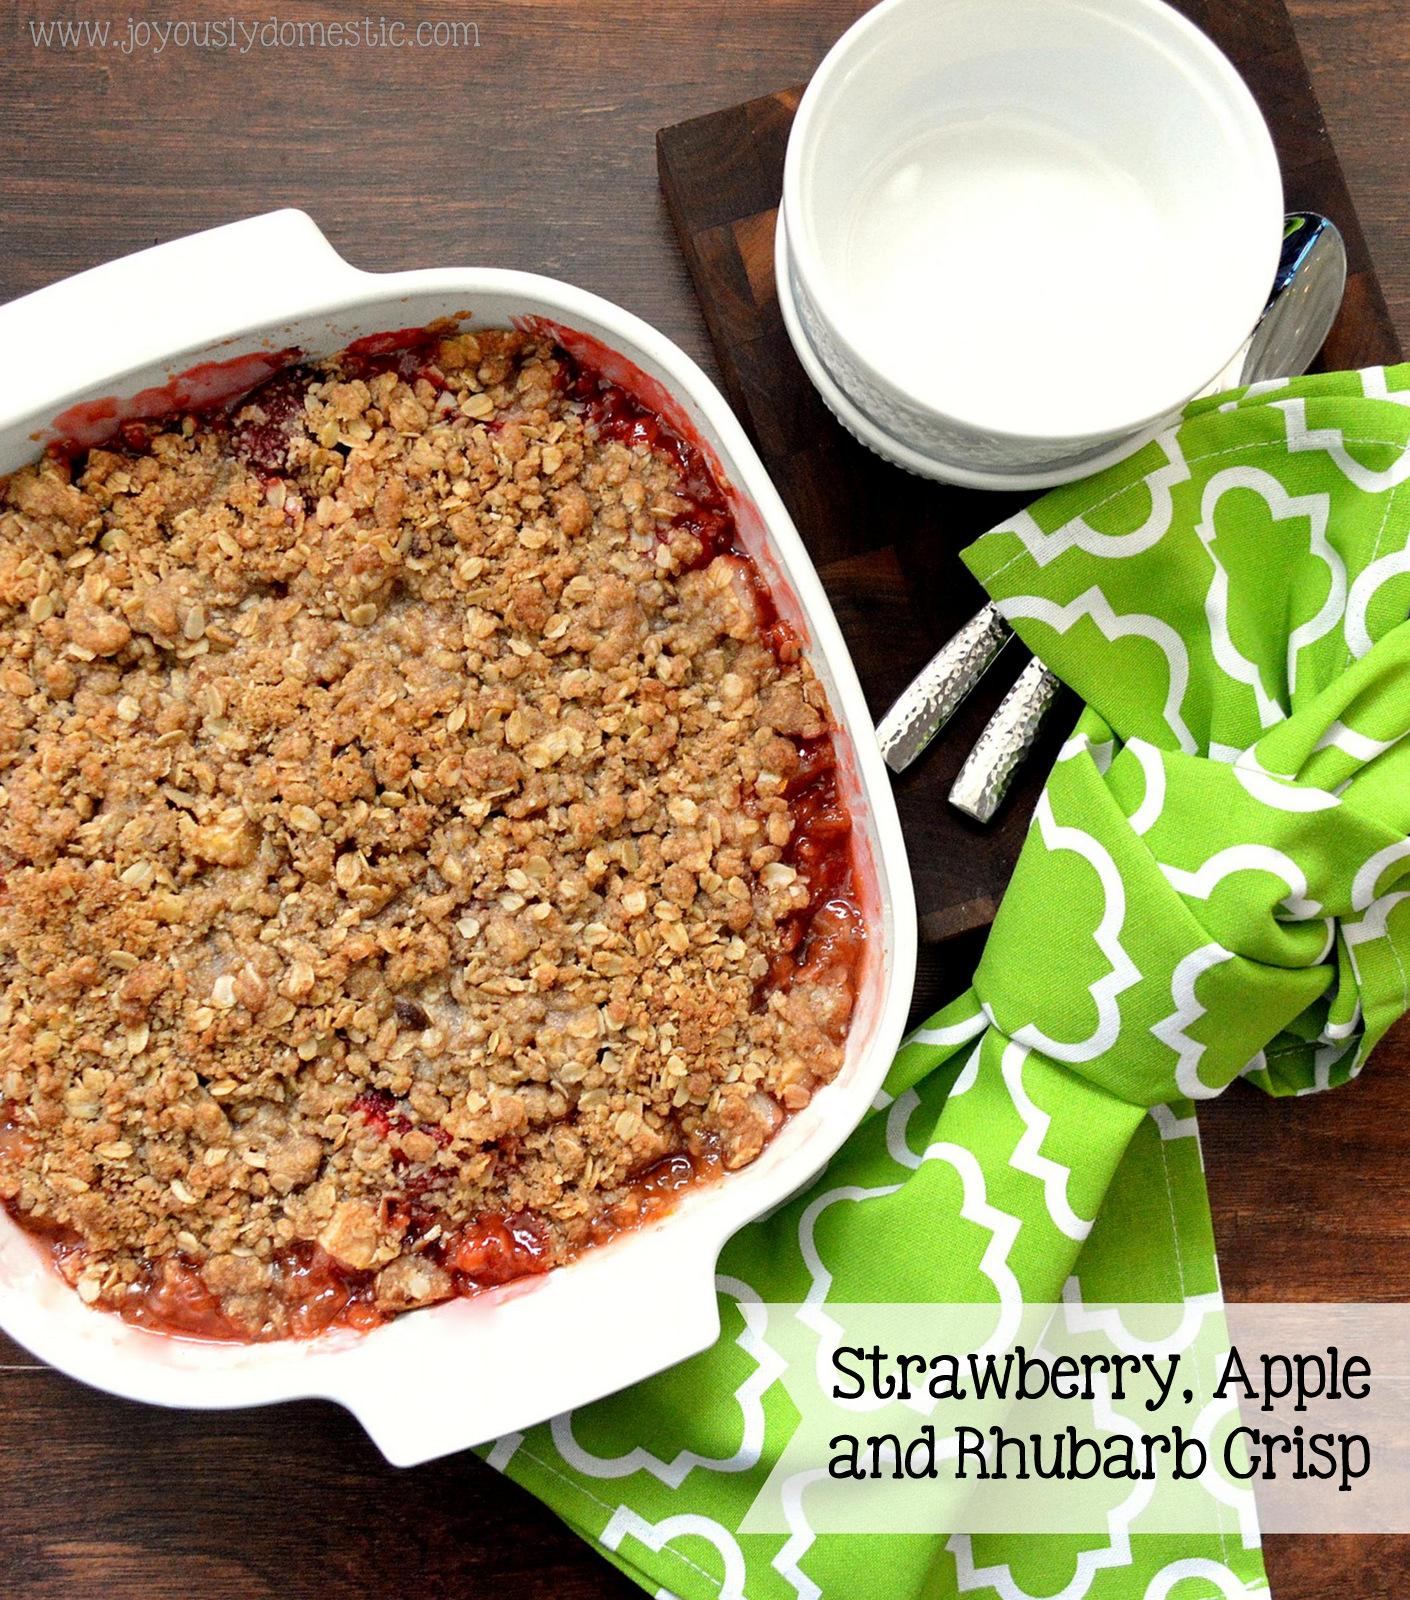 Joyously Domestic: Strawberry, Apple and Rhubarb Crisp